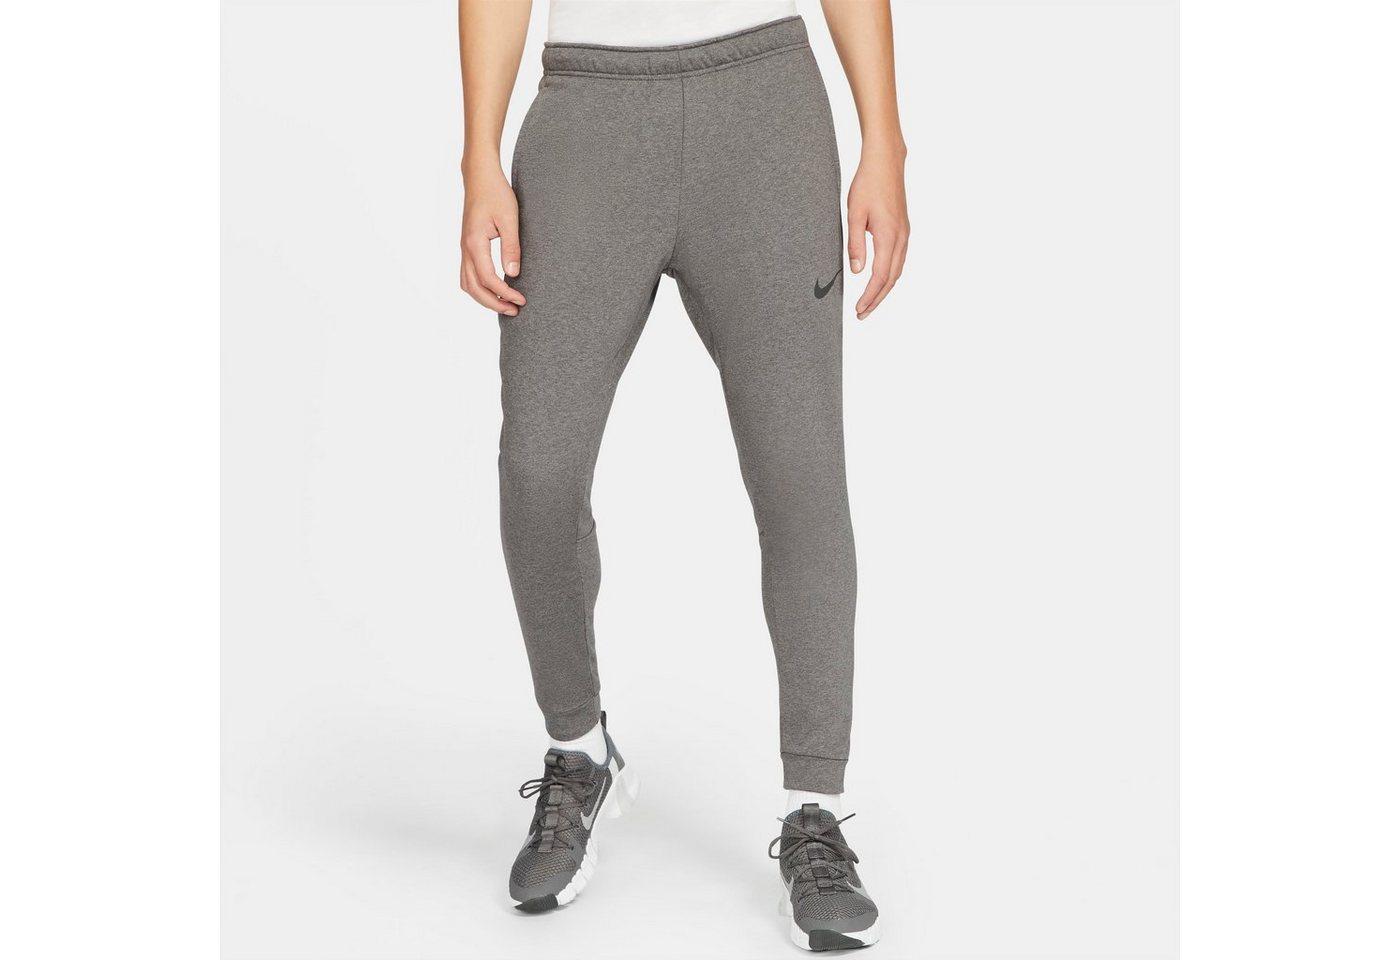 Nike Jogginghose »Nike Dri-fit (3) Men's Tapered Training Pants«, grau